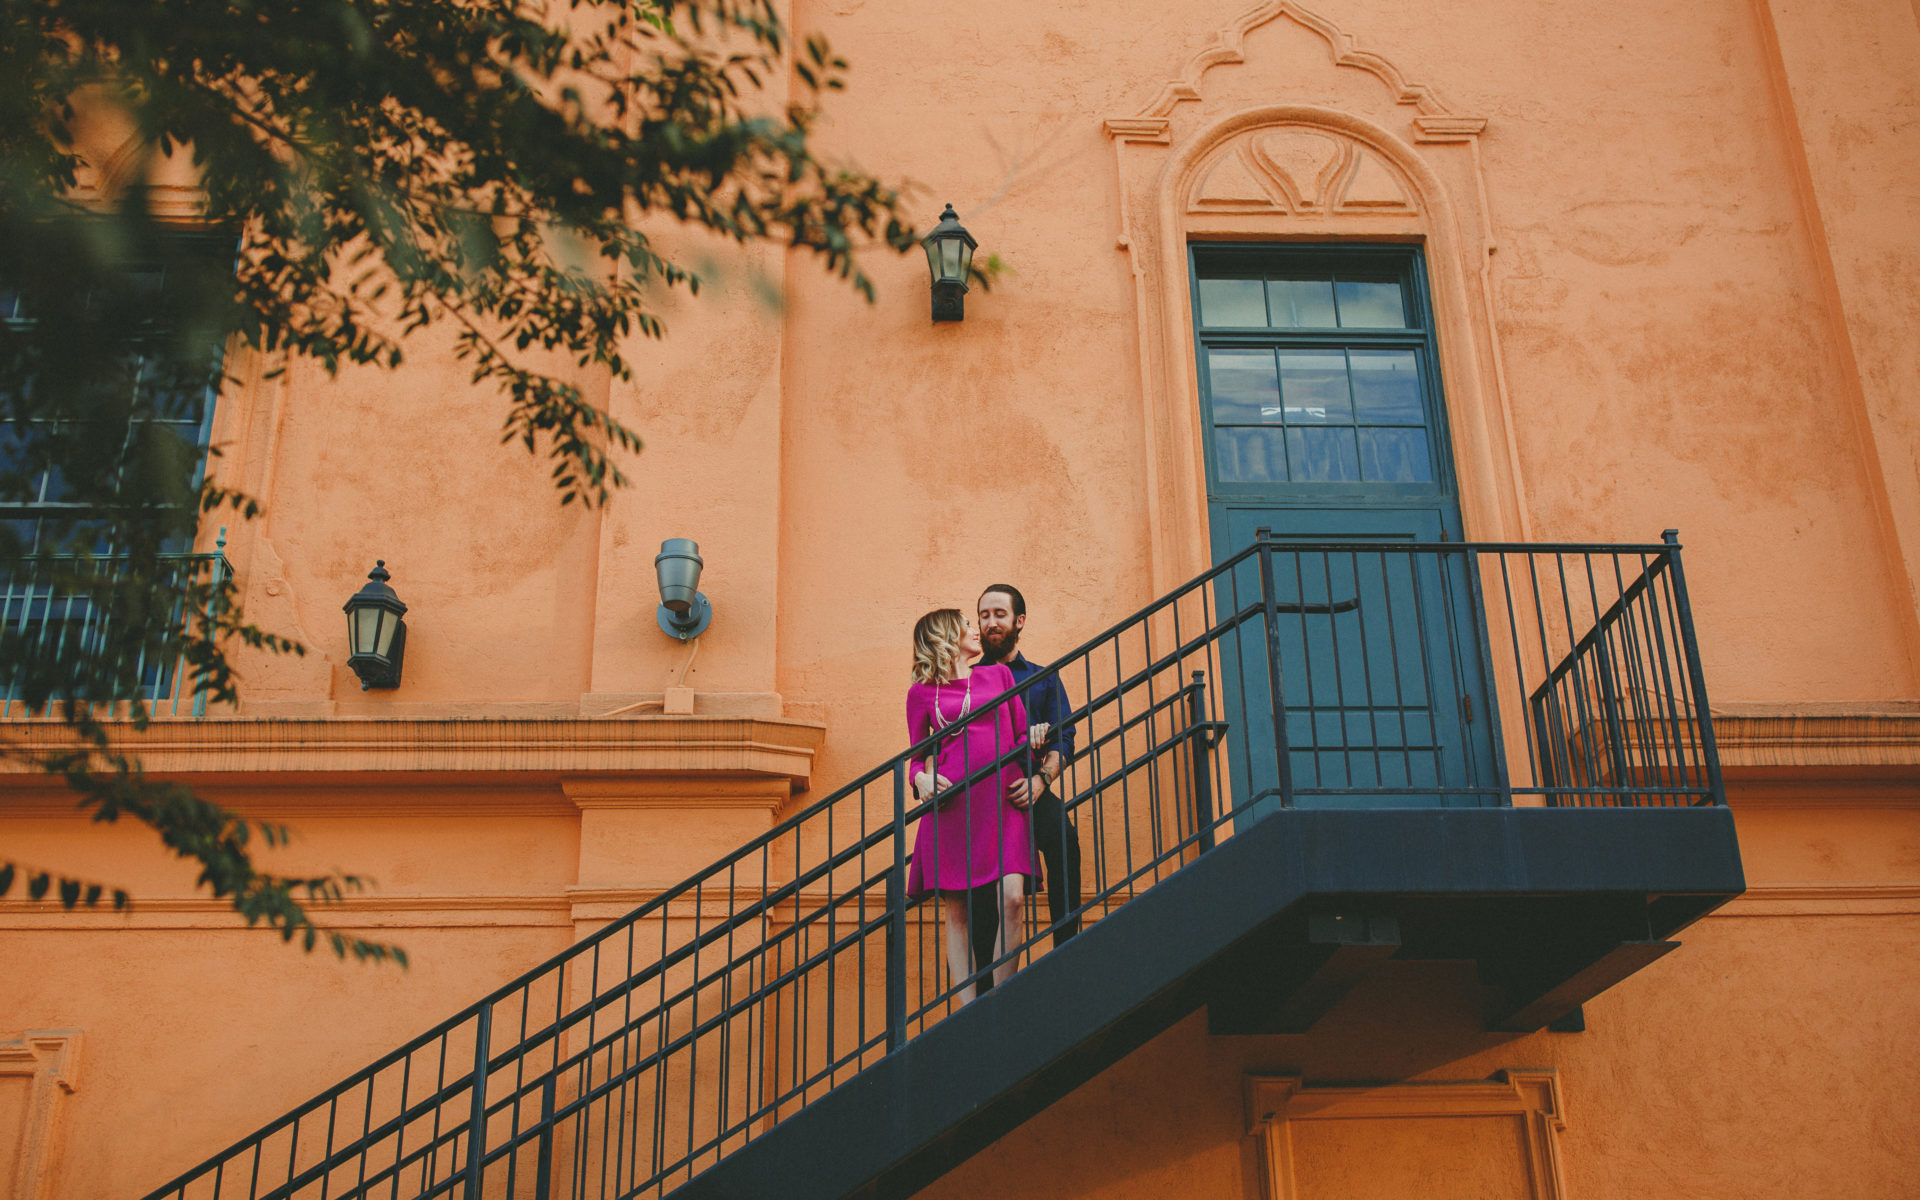 San Diego Horton Plaza Engagement Photos